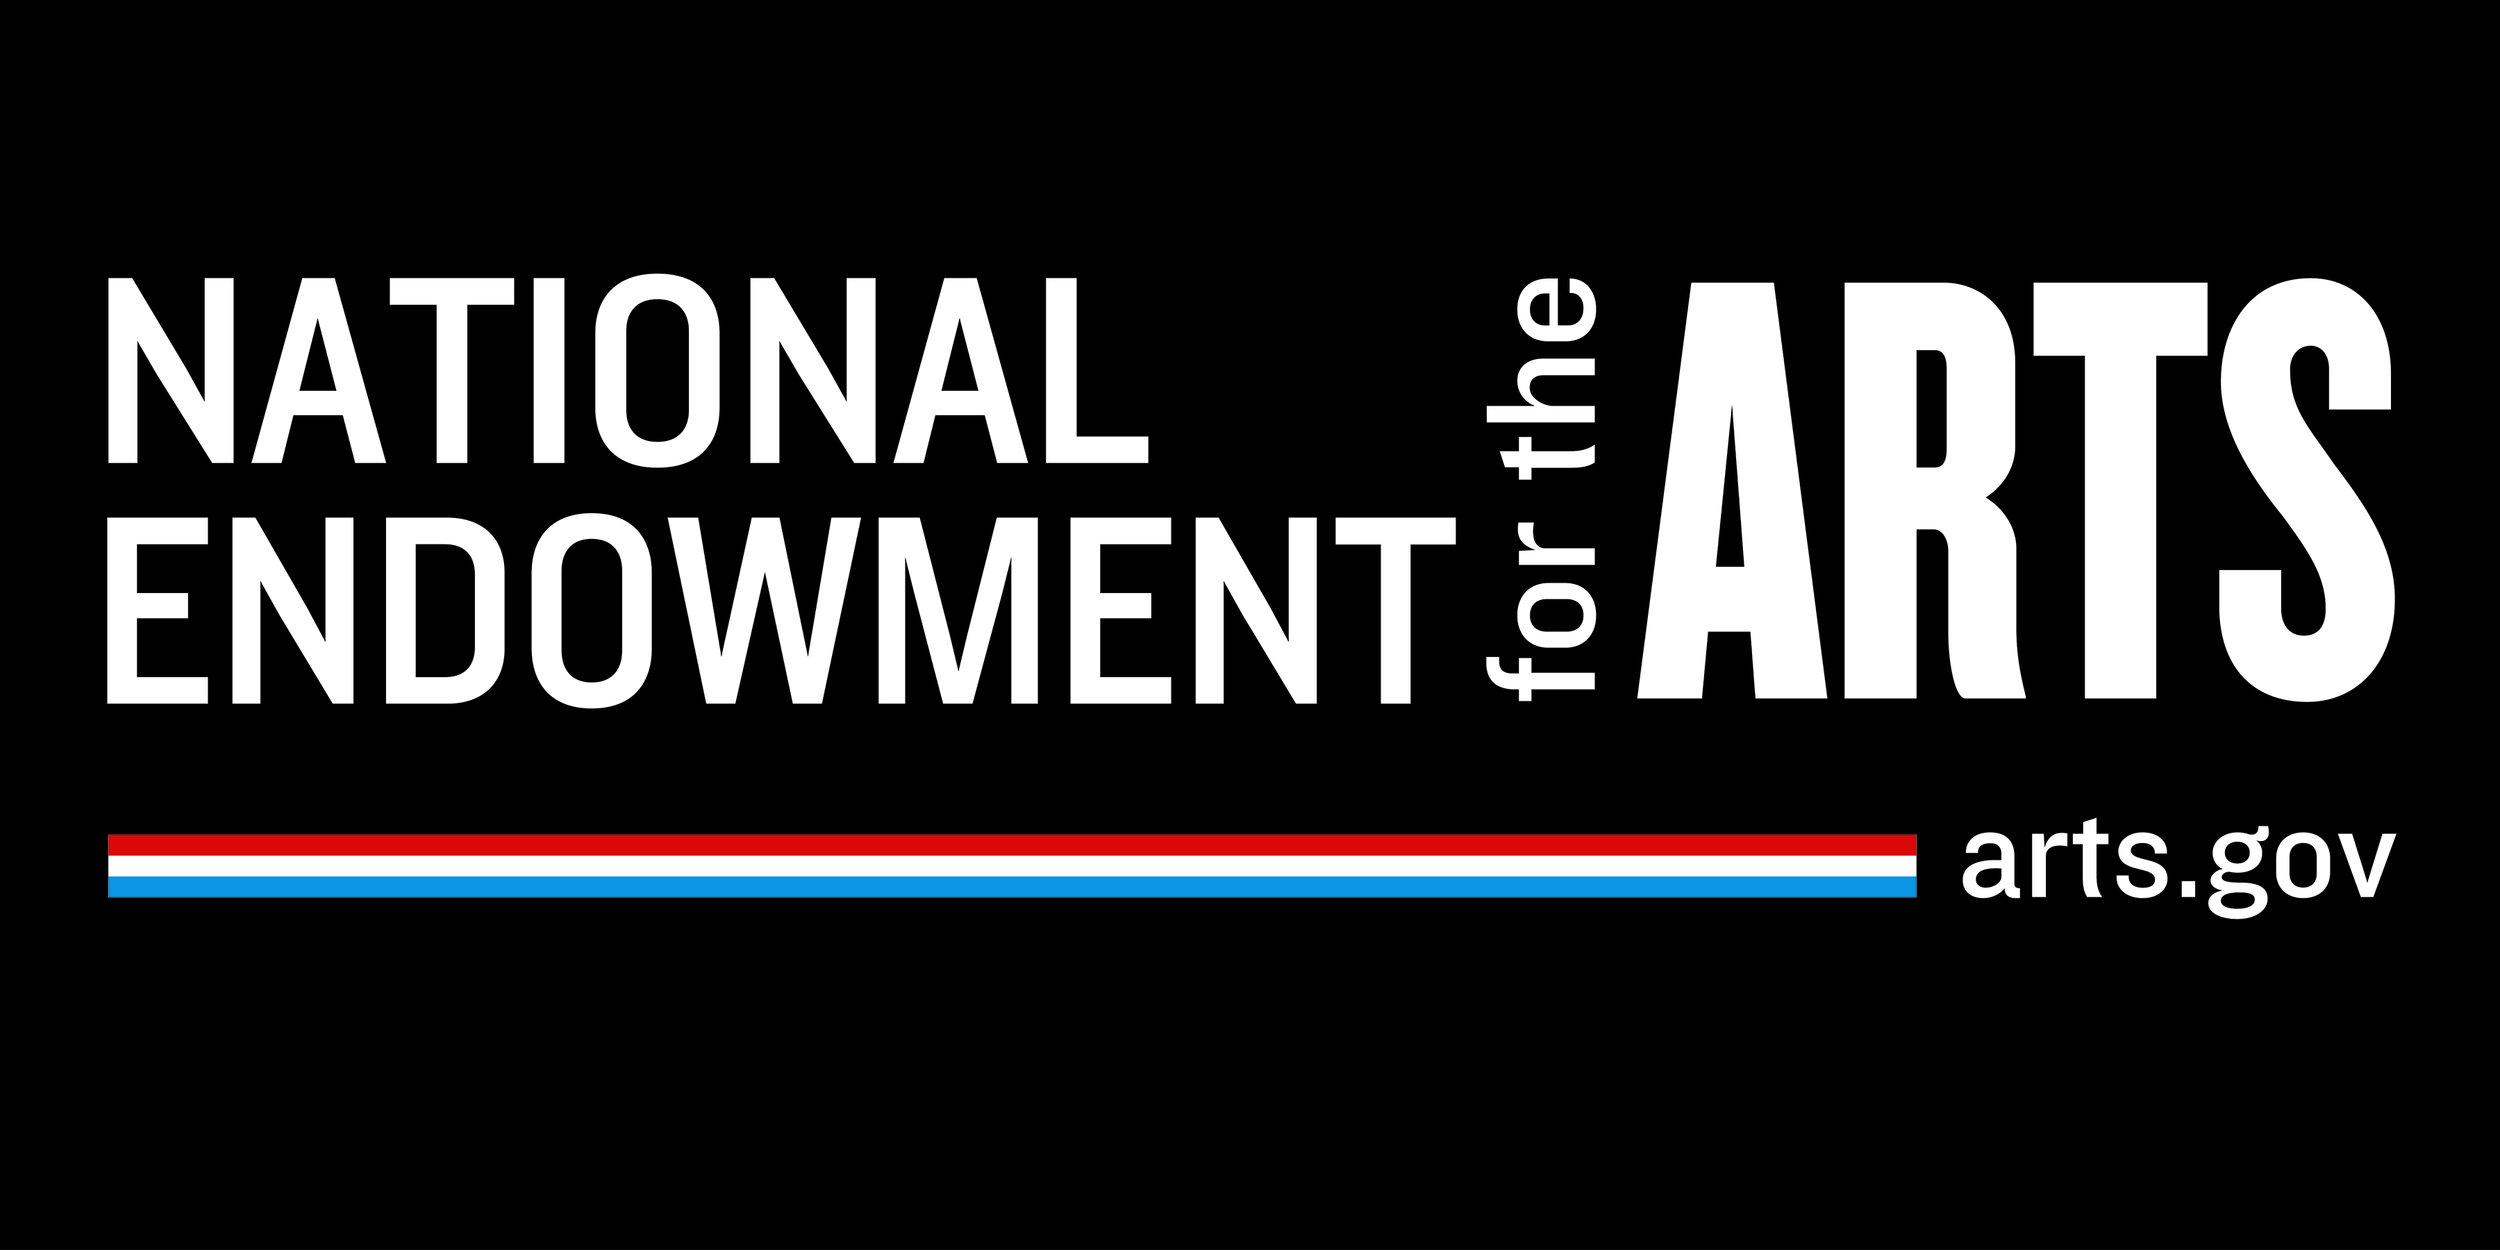 new NEA logo 2018 2019.jpg